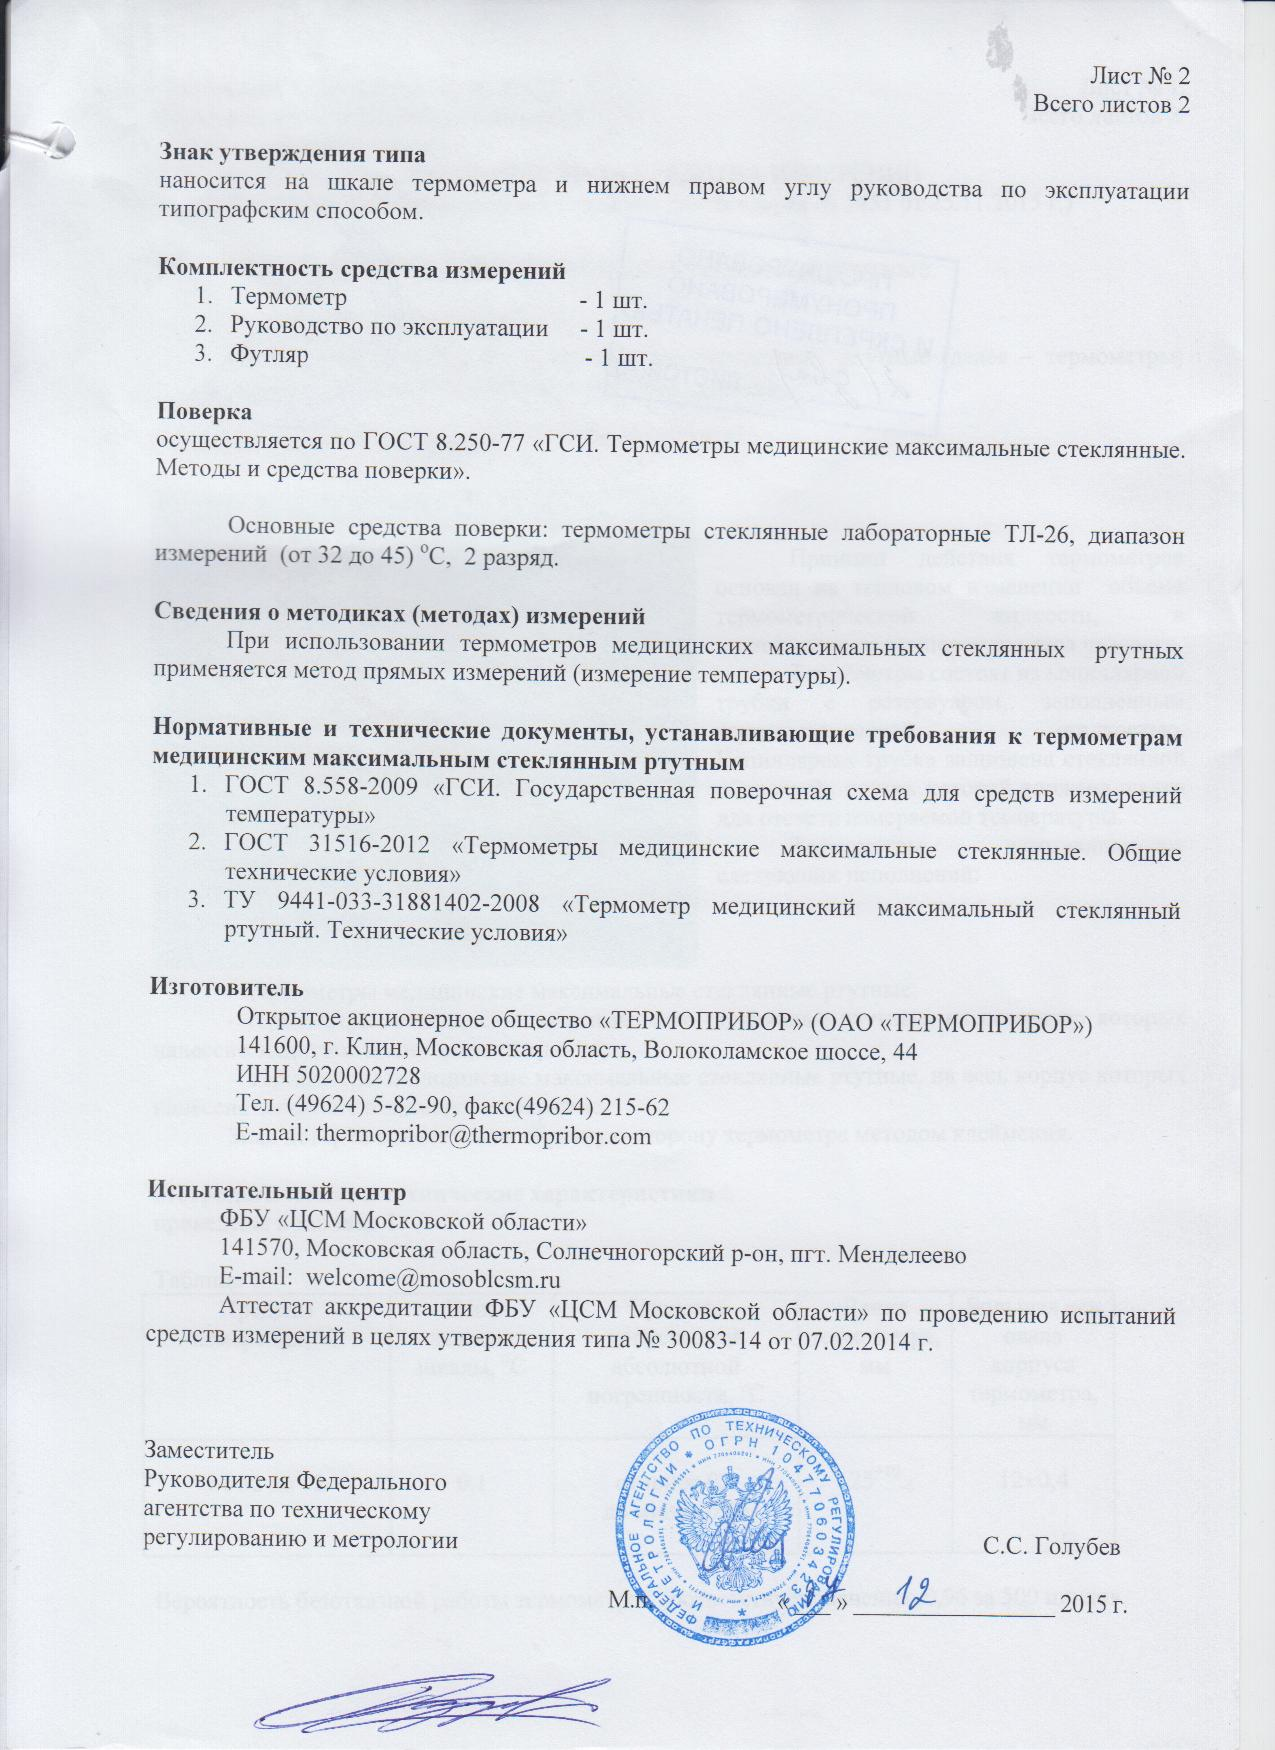 prilozh-2-svidetelstvo-utv-37472